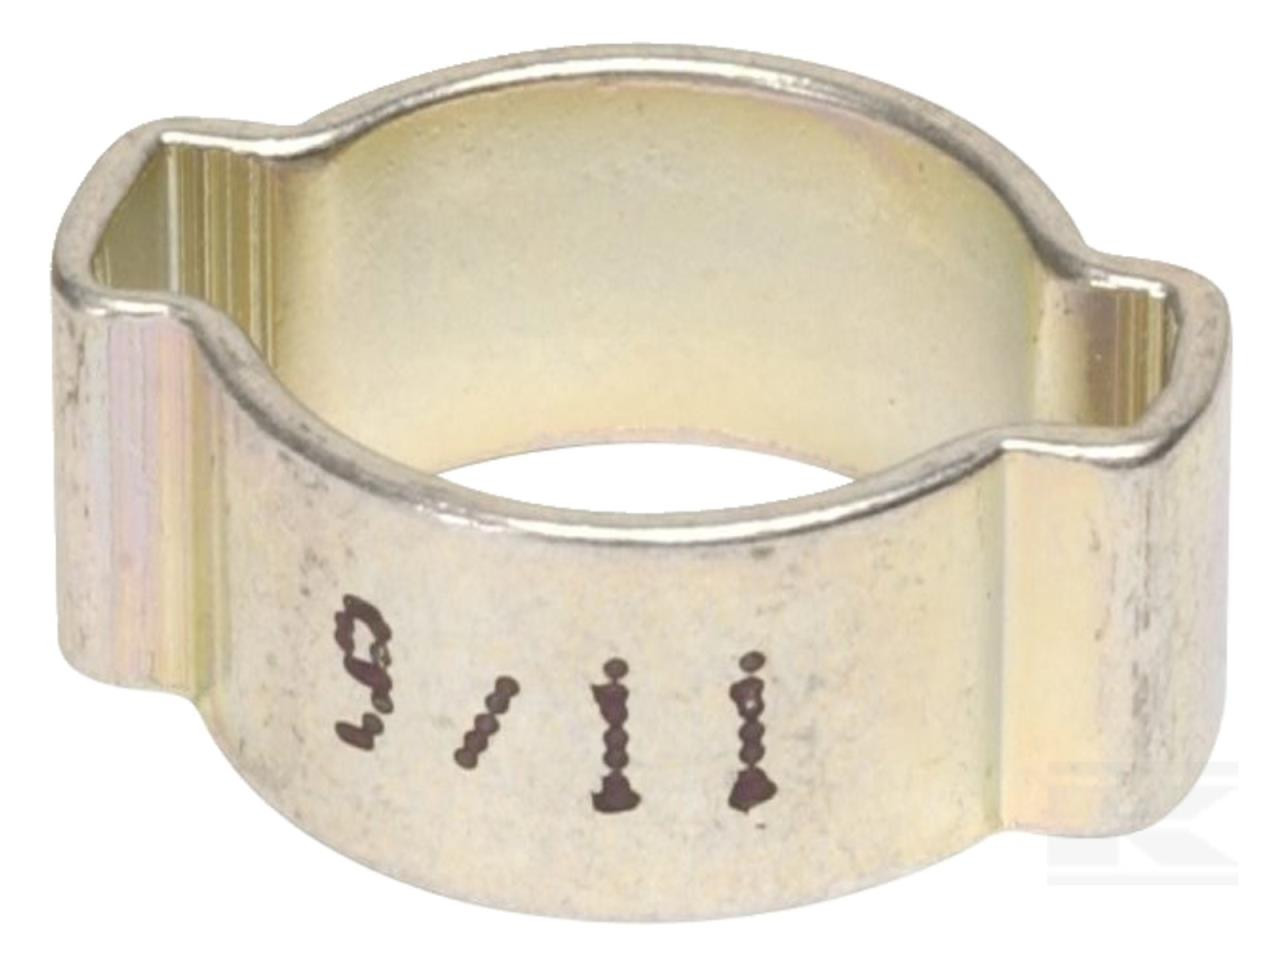 Øreclamp, ABA 9-11mm